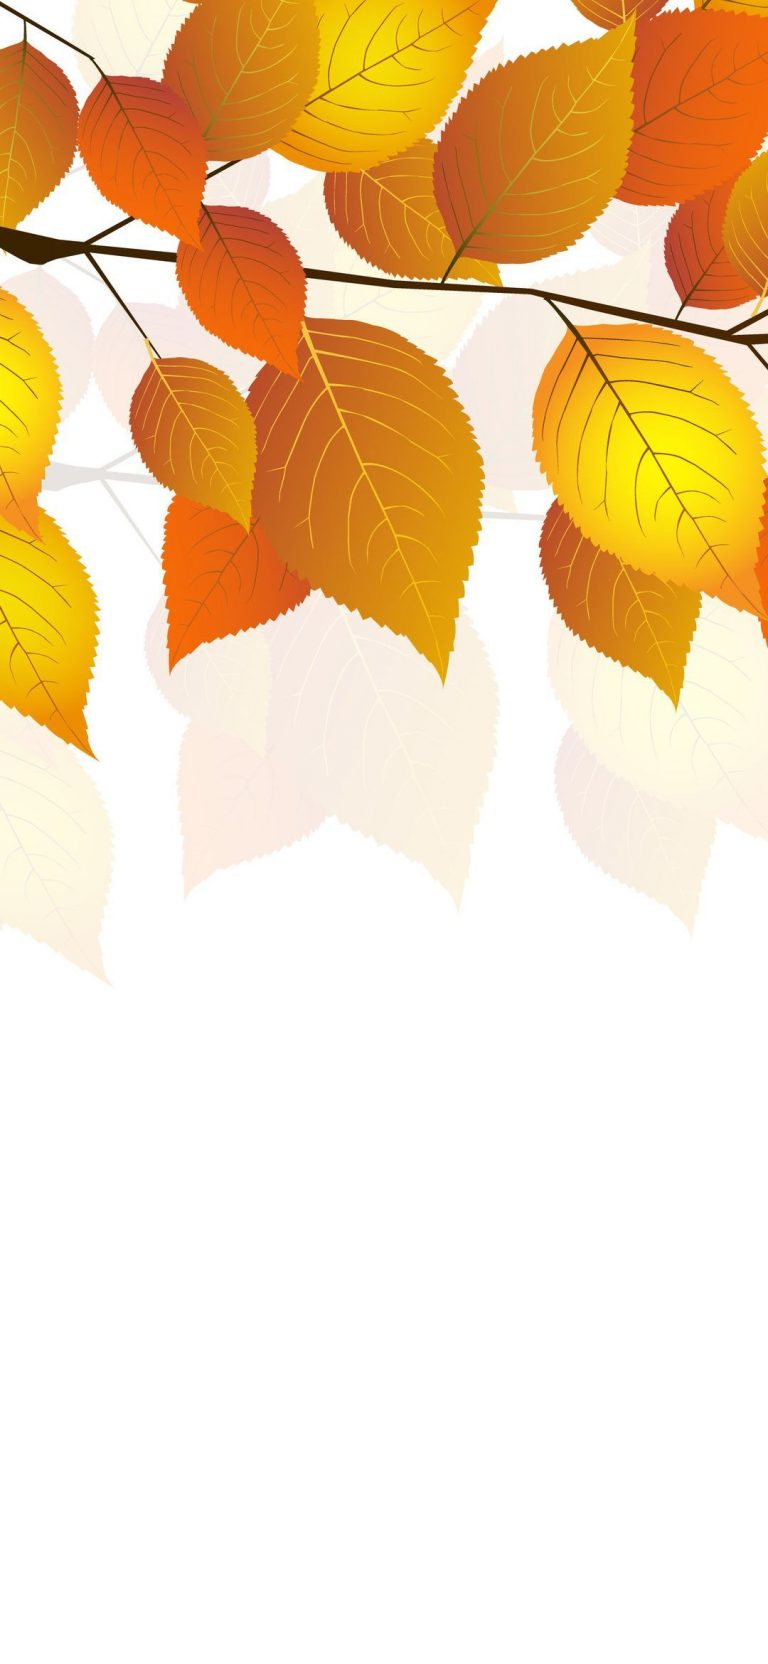 Autumn Phone Wallpaper 061 768x1664